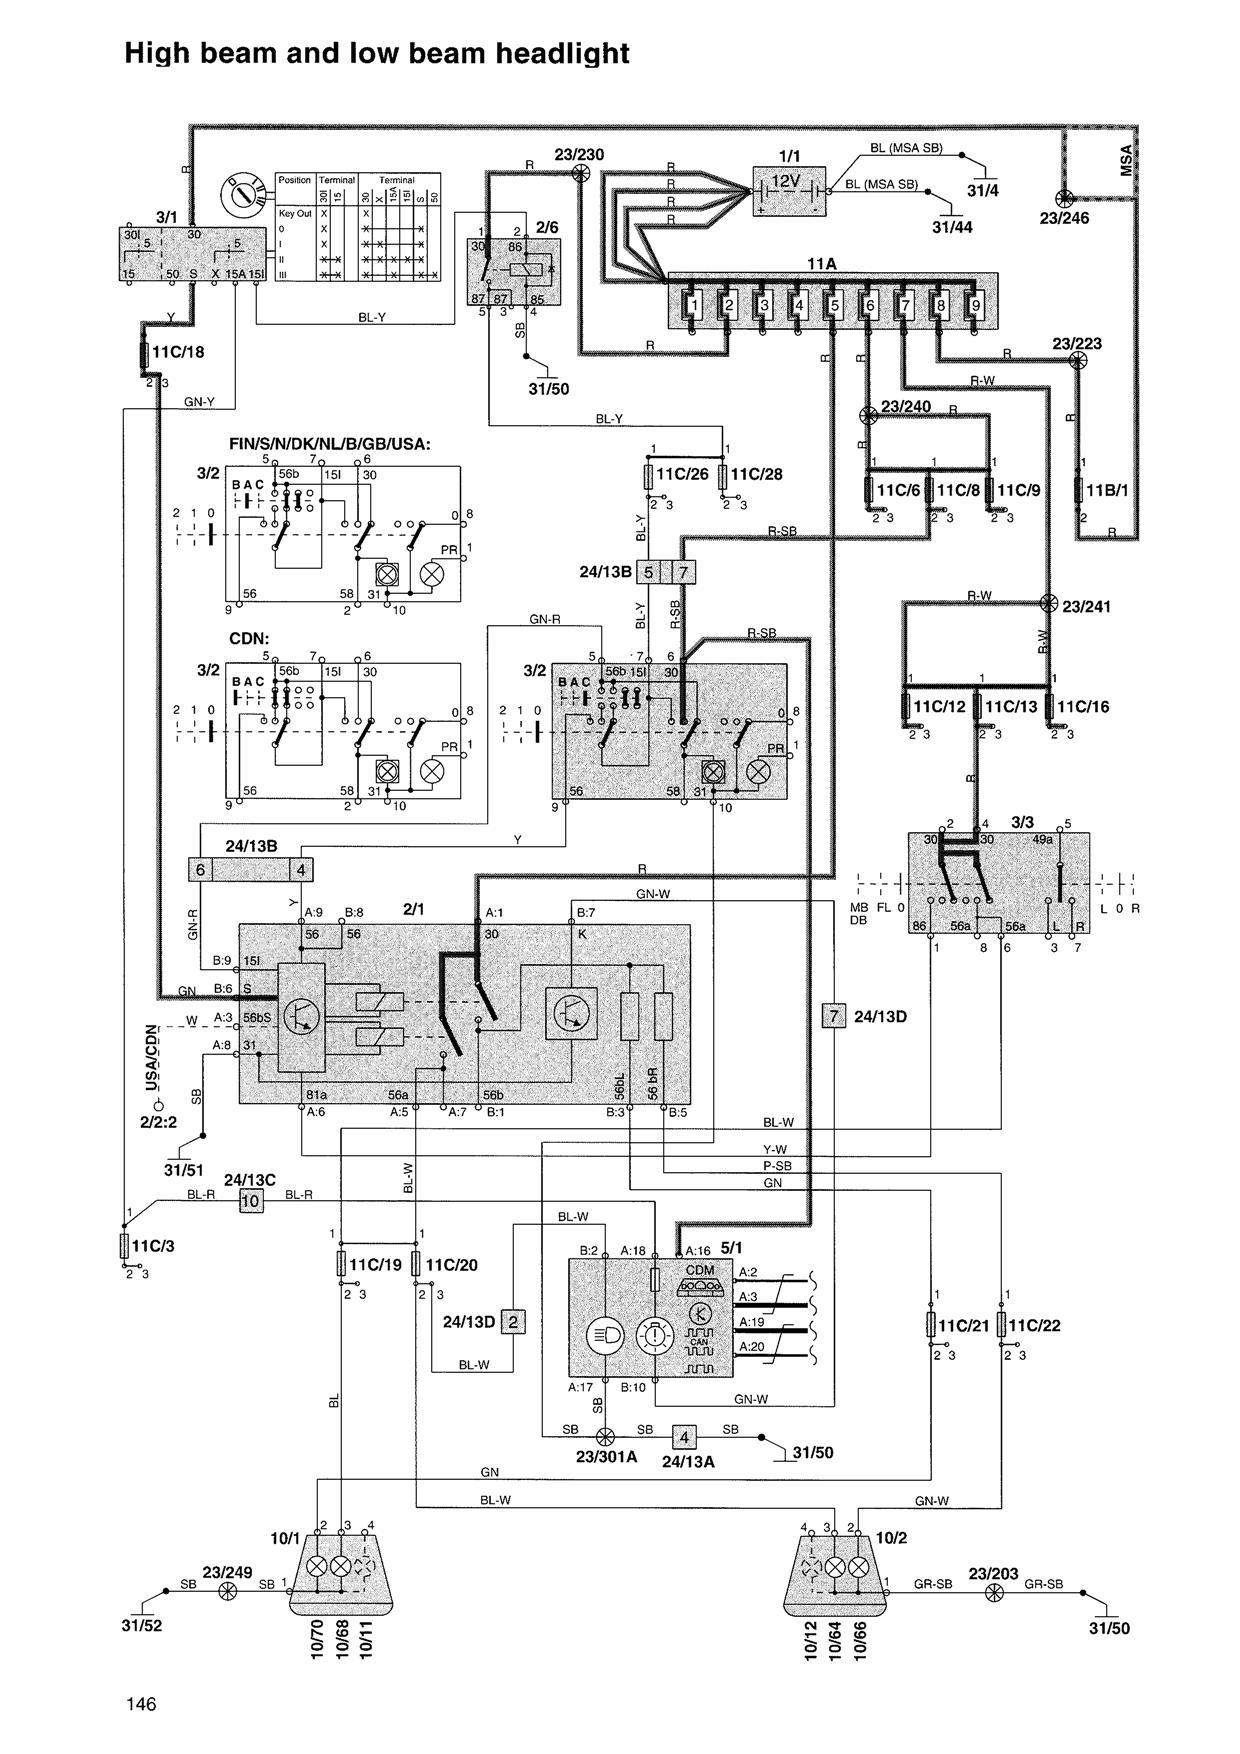 volvo wiring diagrams volvo image wiring volvo wiring diagrams volvo image wiring diagram on volvo wiring diagrams